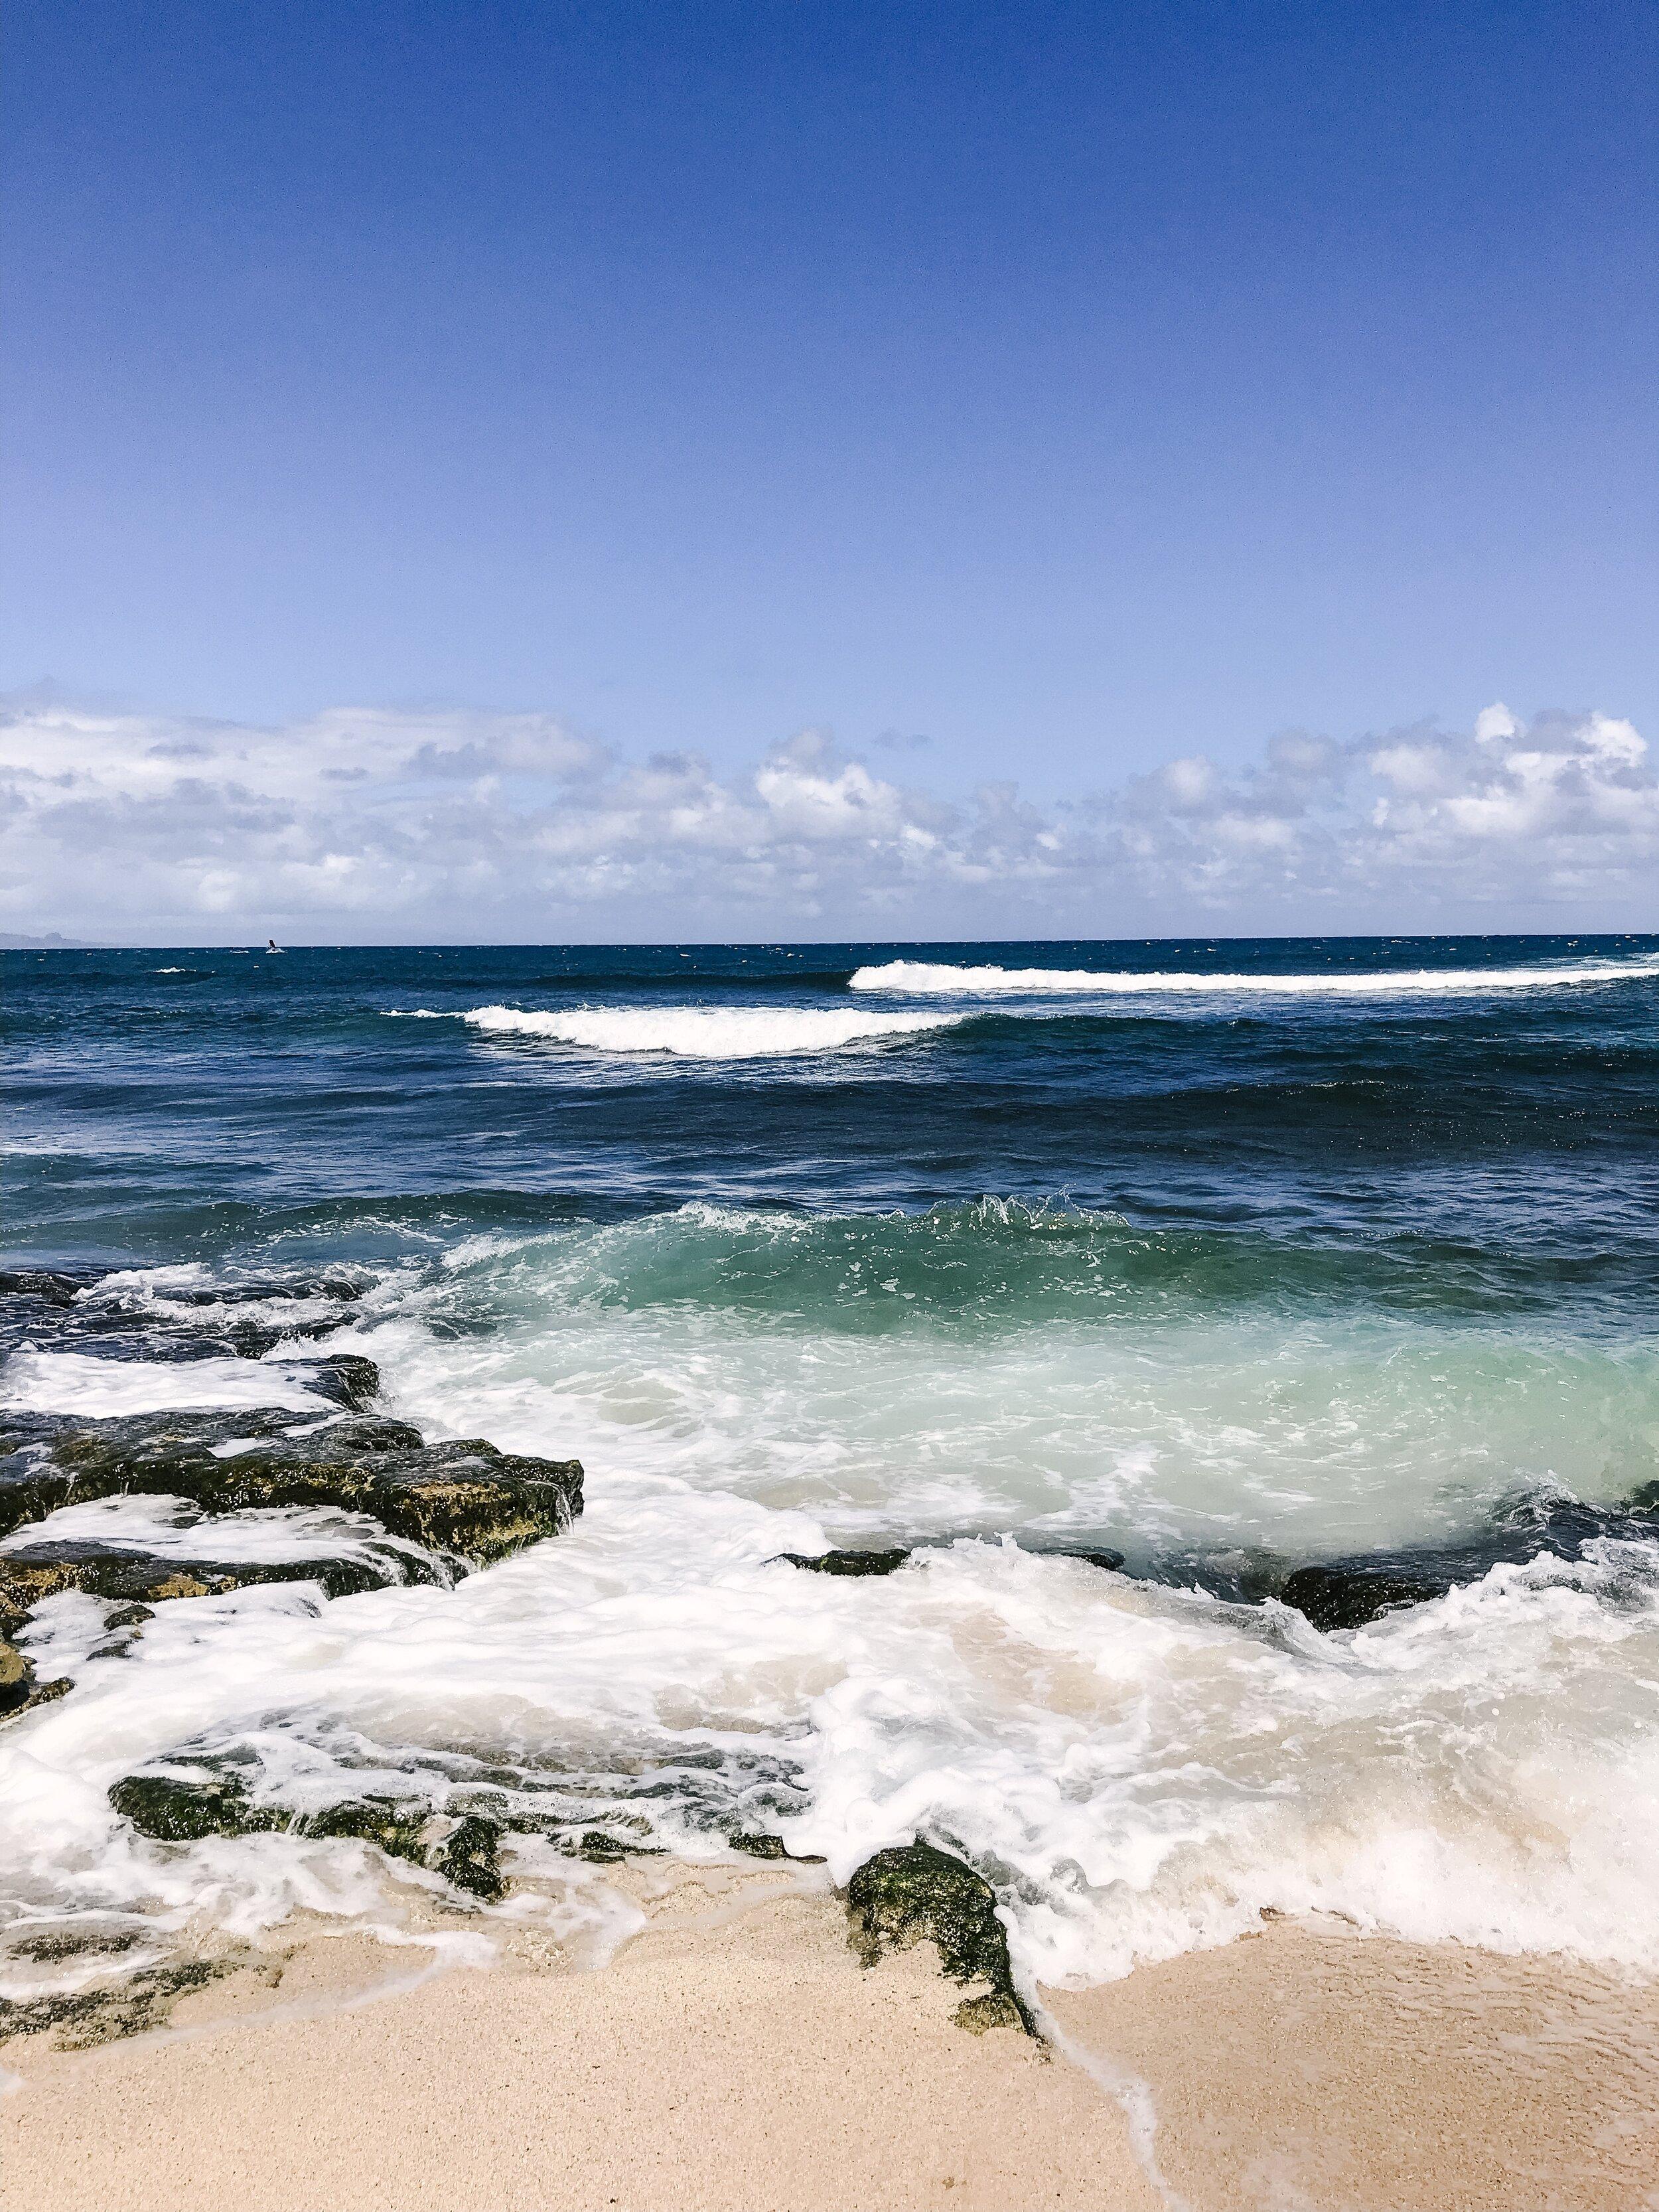 Maui Travel Guide 2019